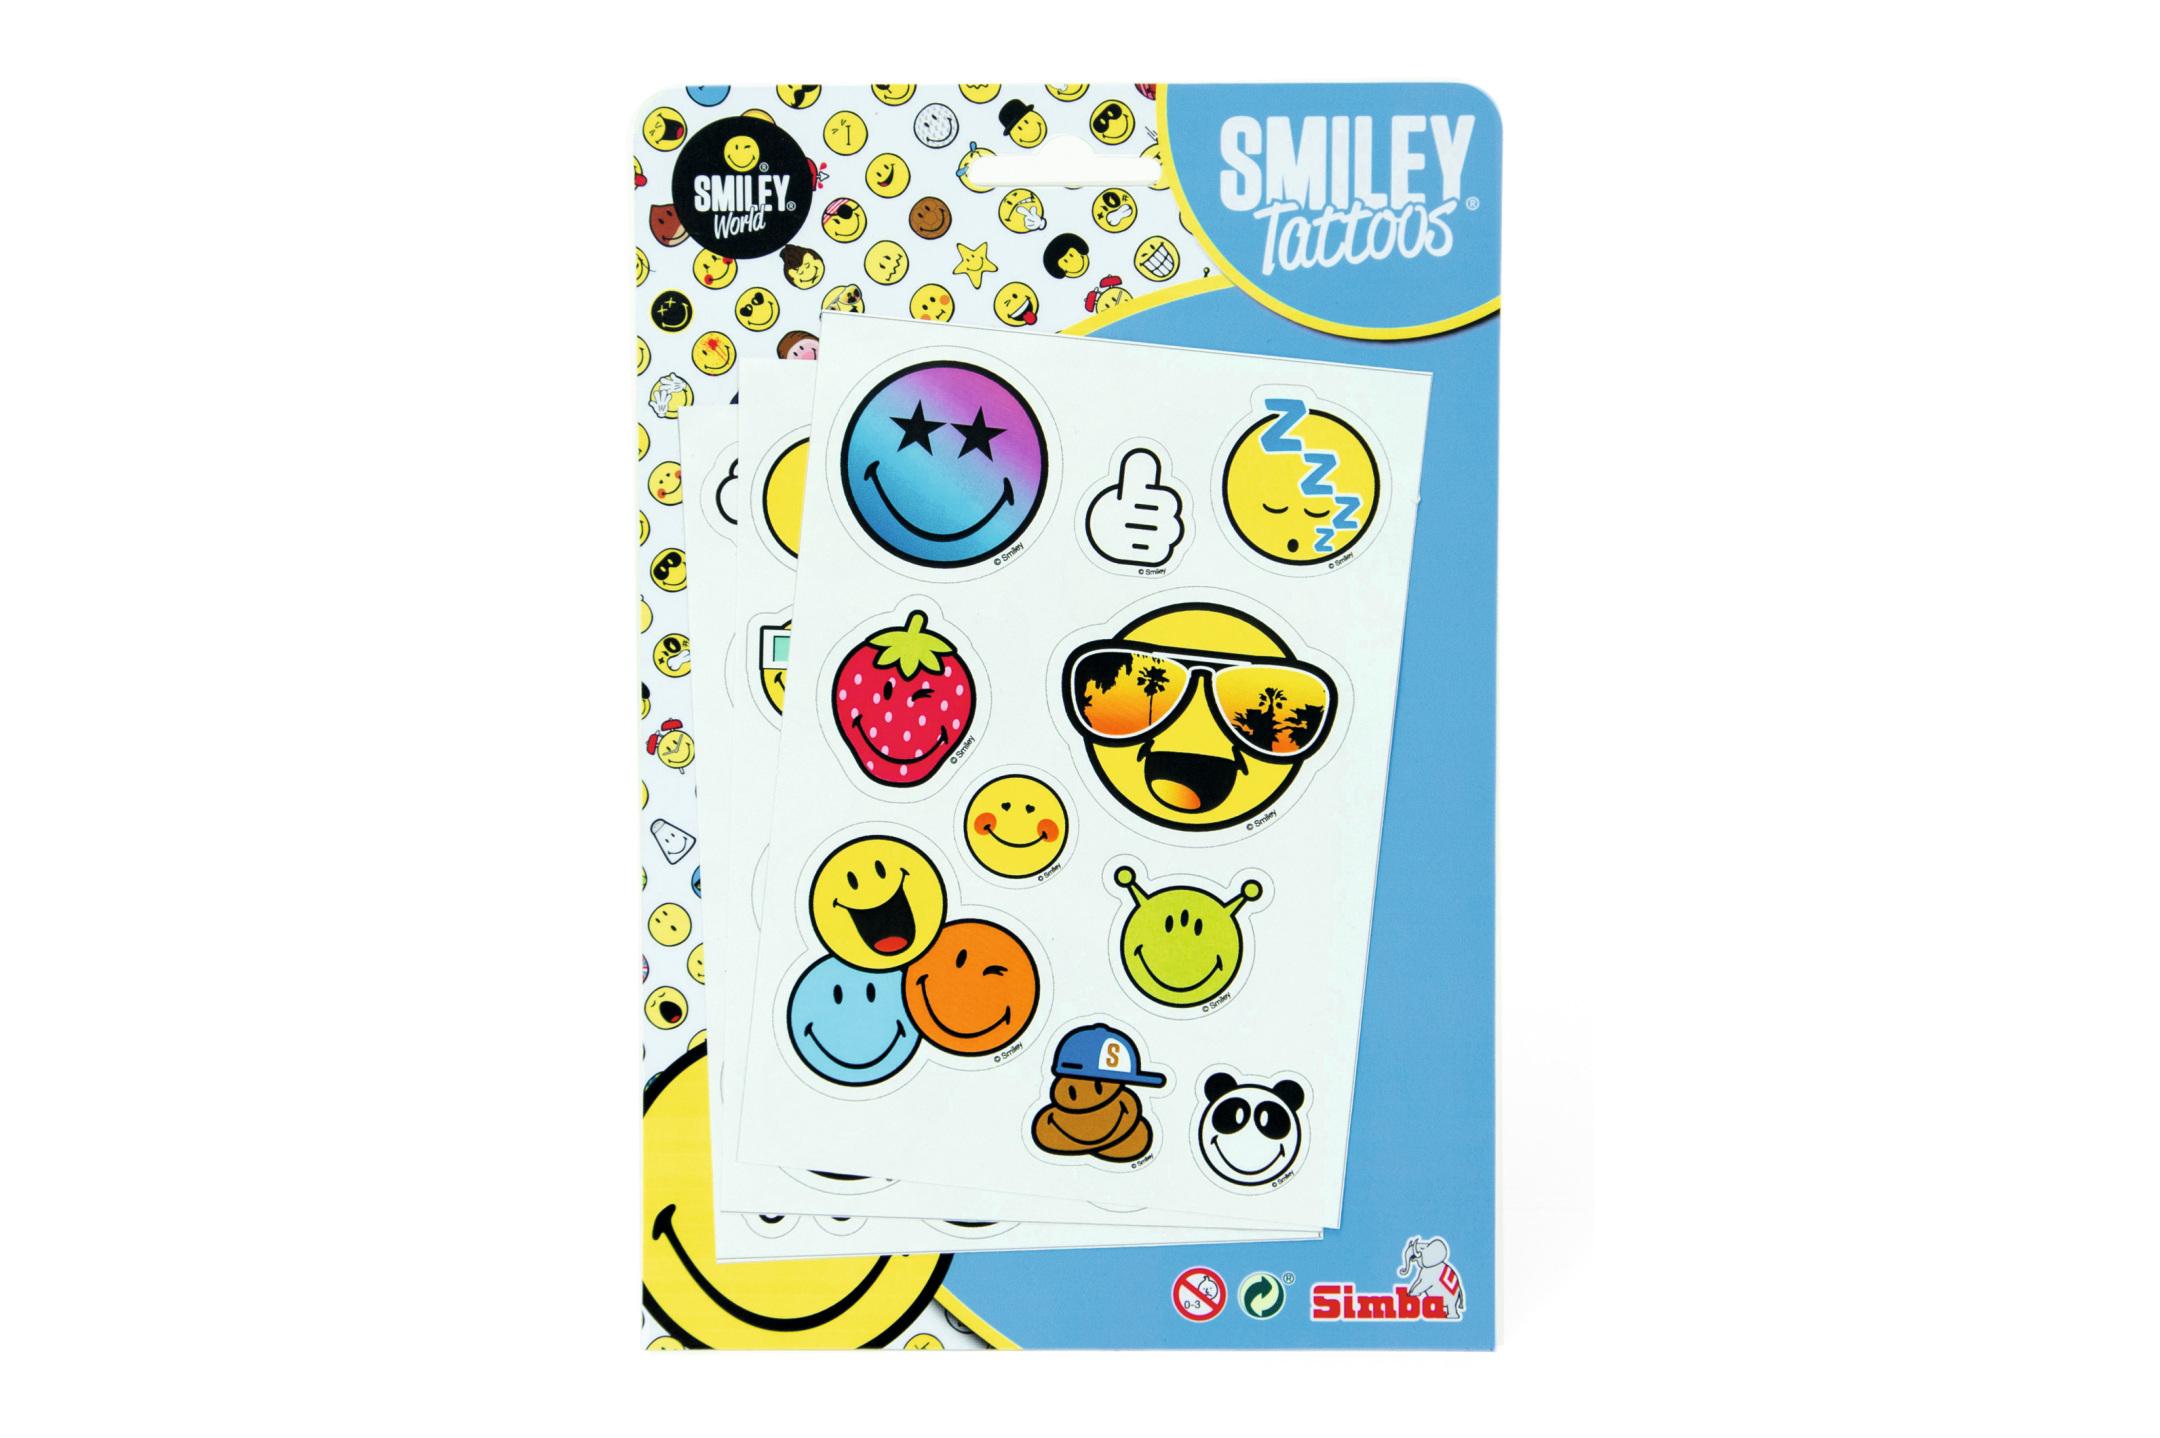 Smiley Tattoos